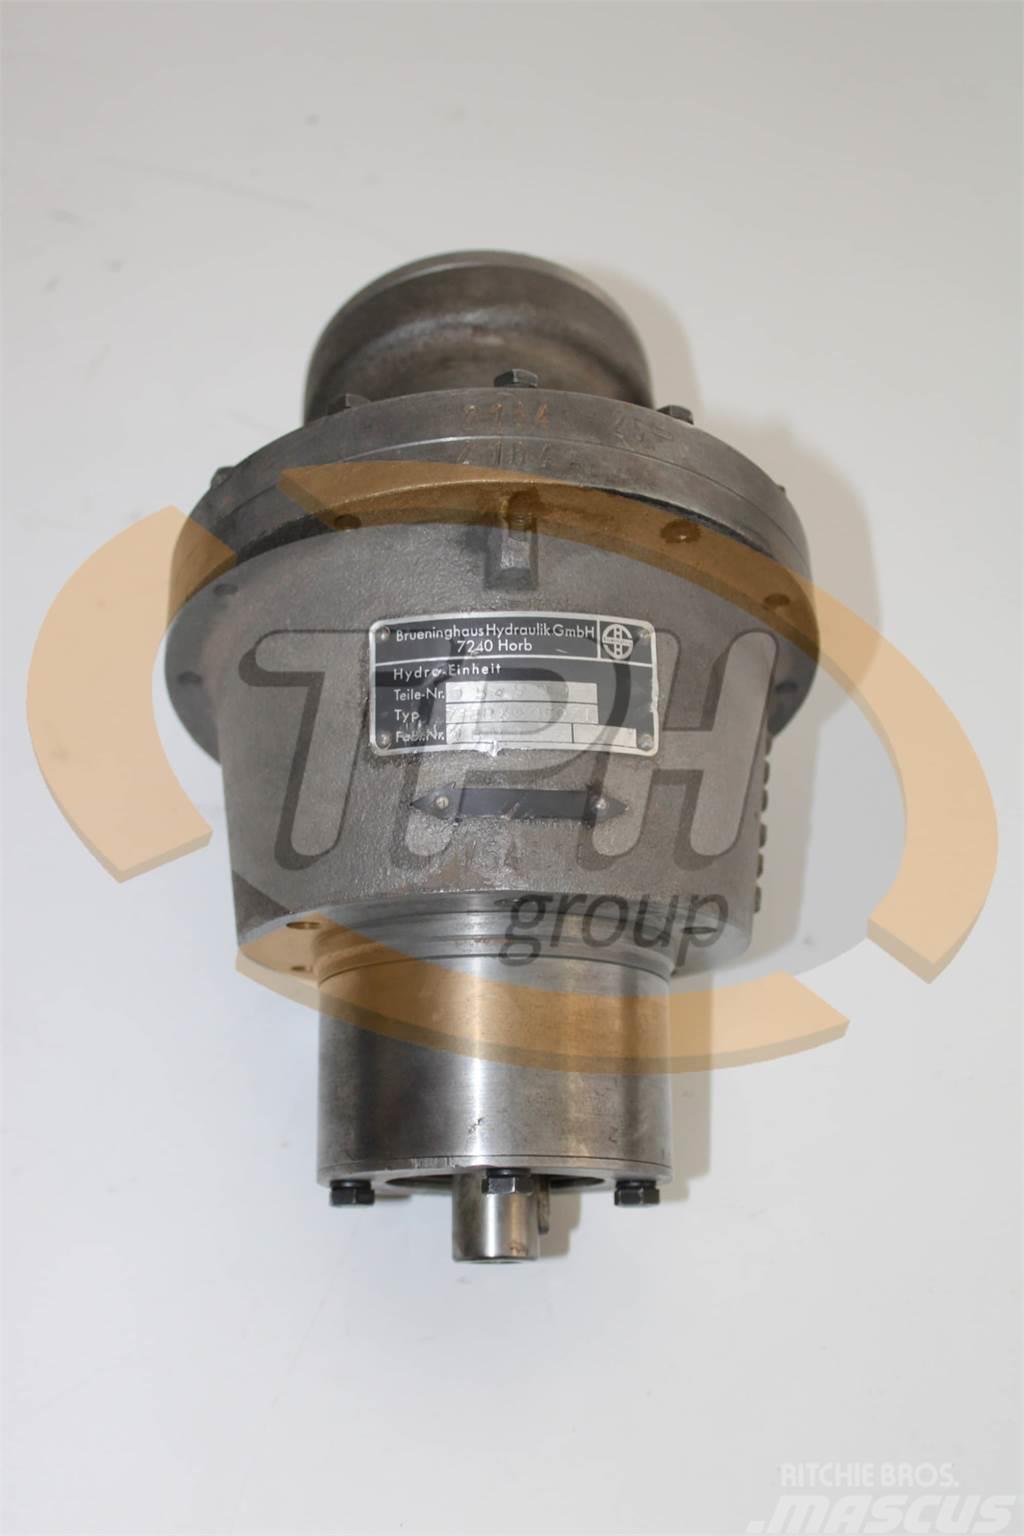 [Other] Brueninghaus 054992 Hydraulik Motor 712BX8000ZL